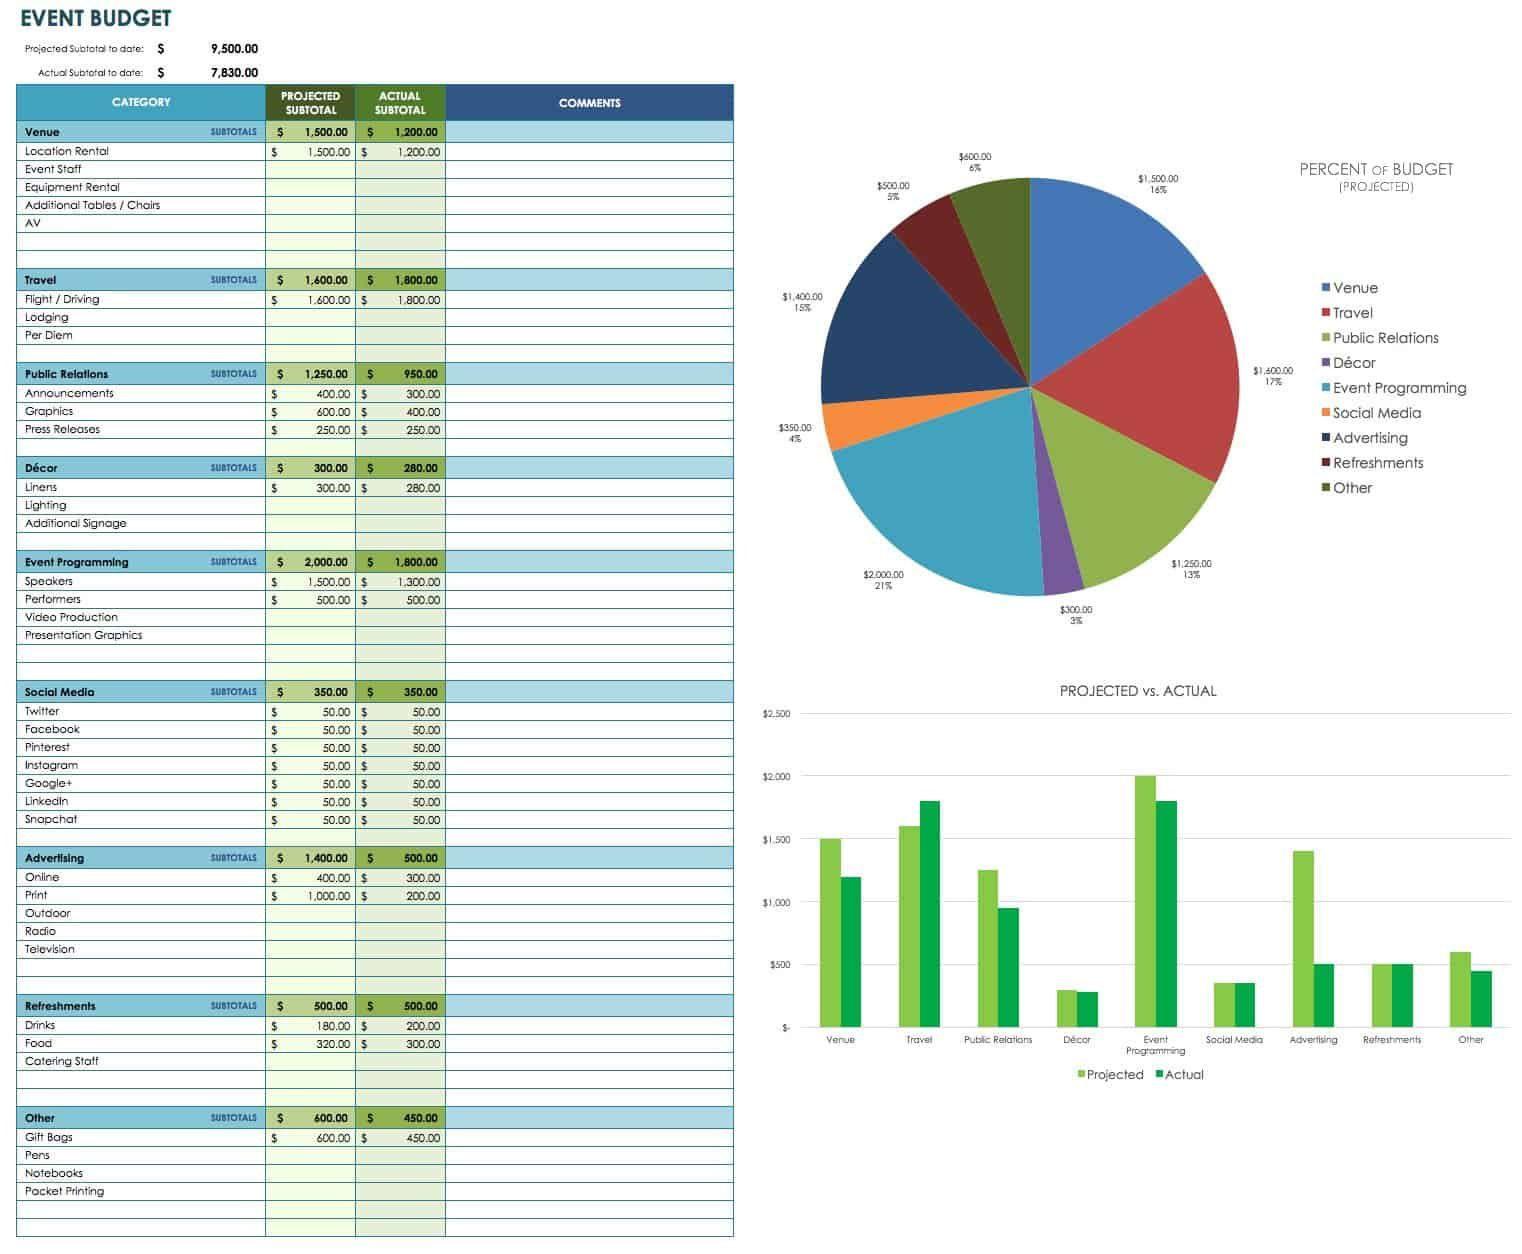 007 Shocking Line Item Budget Spreadsheet Image  Template Word FreeFull